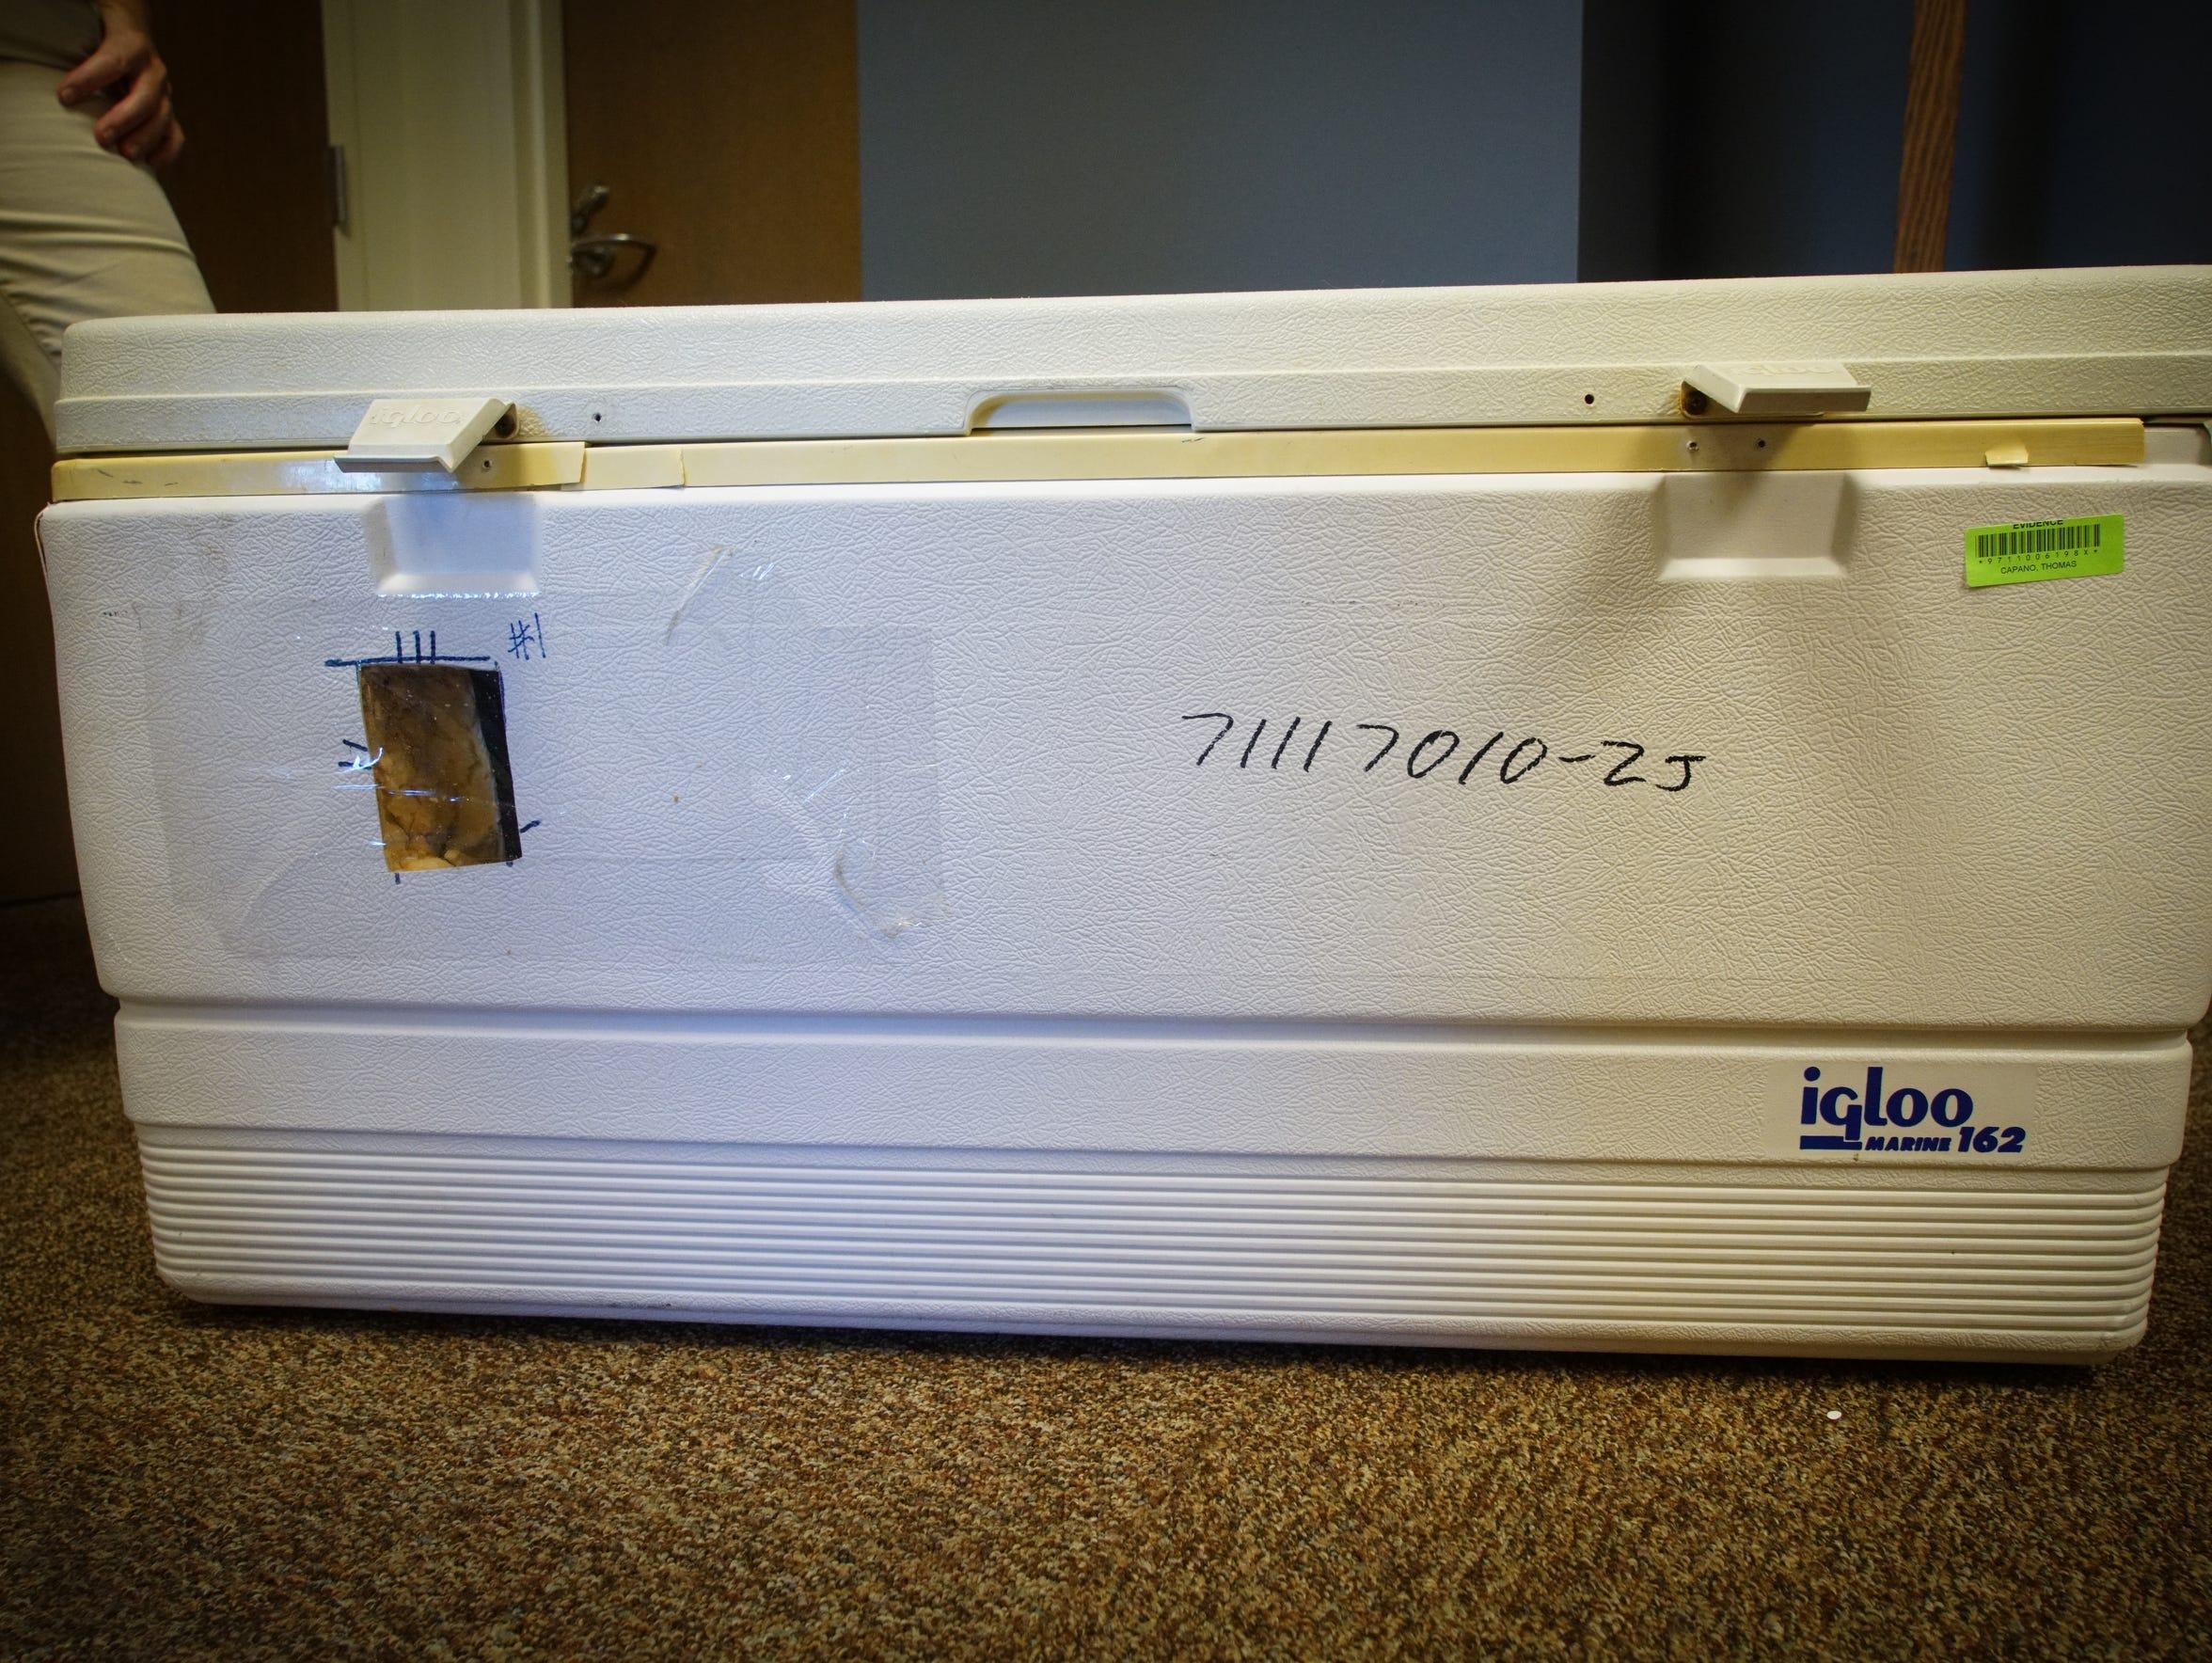 The 40.5 gallon Igloo fishing cooler that Tom Capano